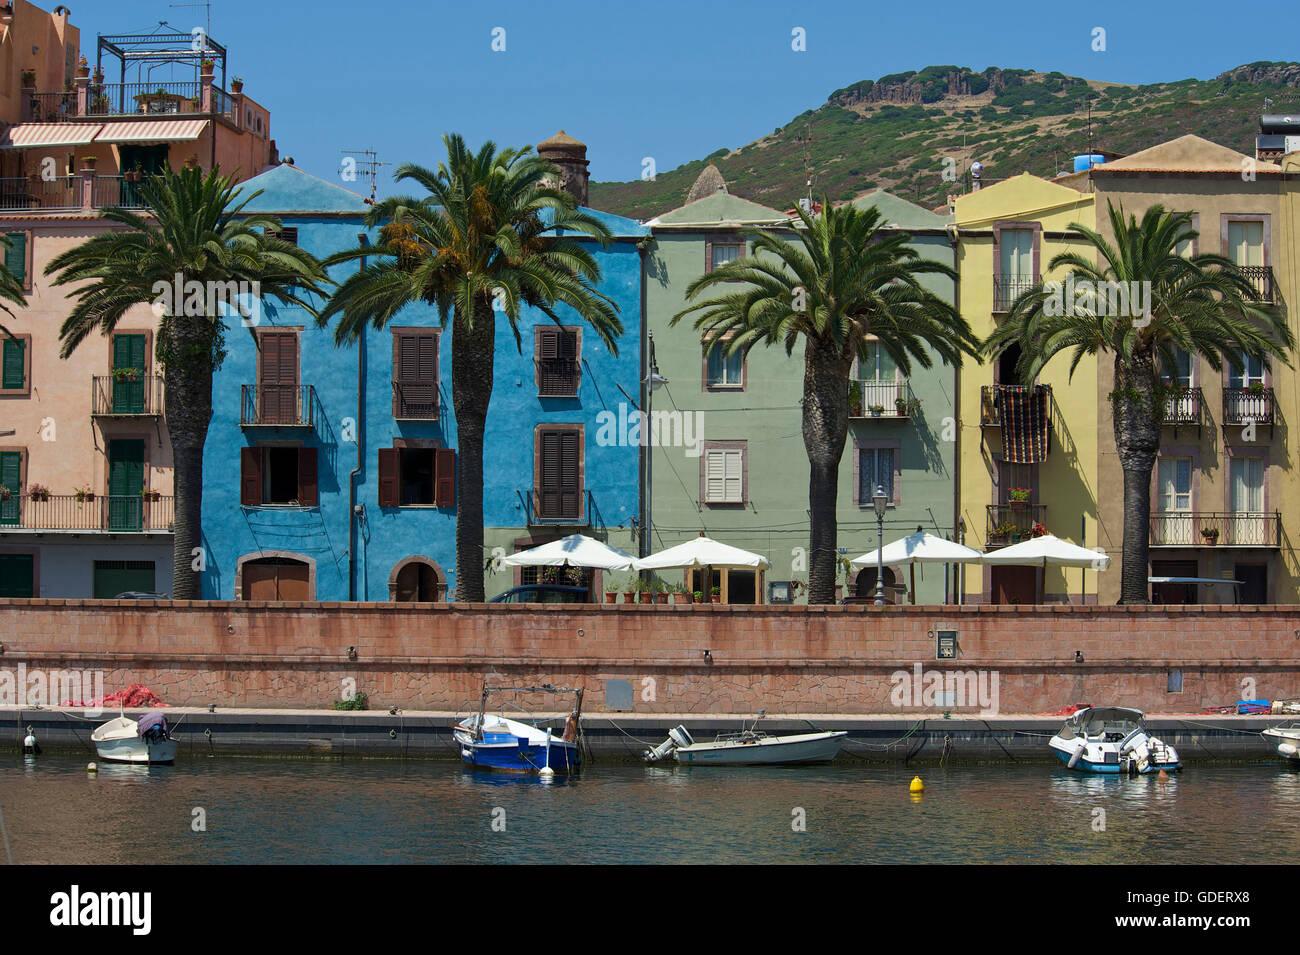 Bosa, Fiume Temo, Sardegna, Italia Foto Stock